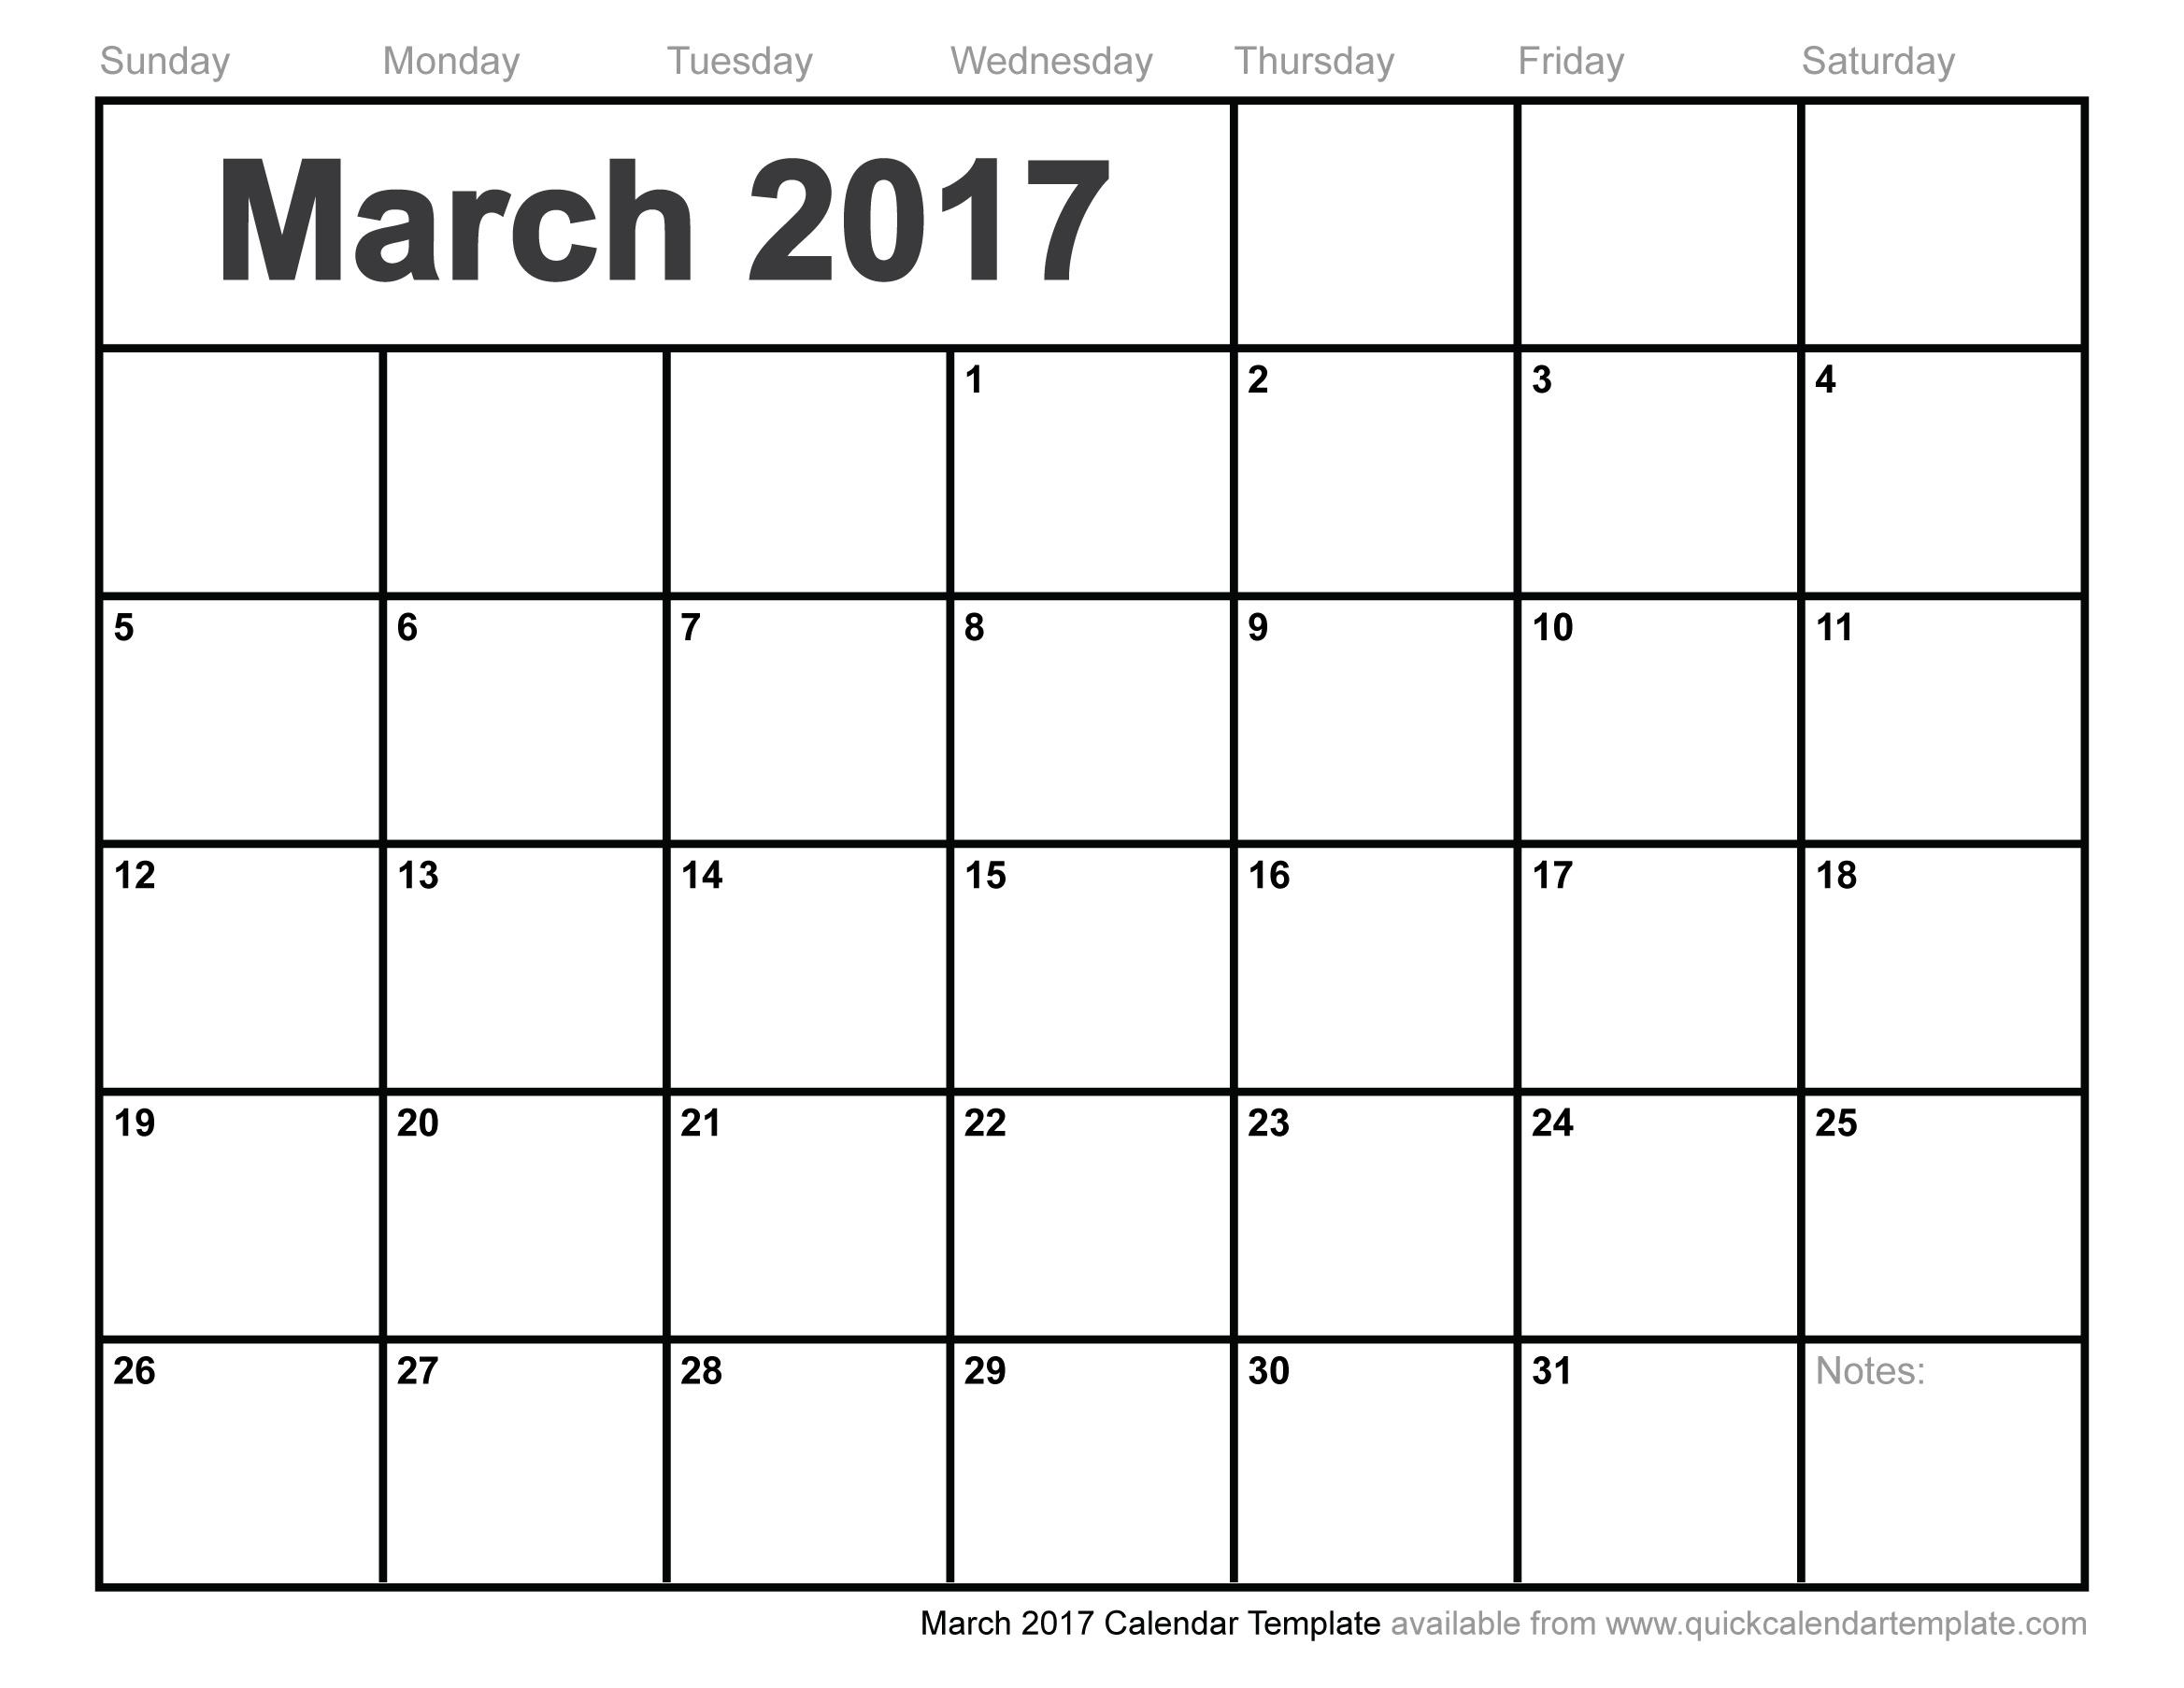 Free-Blank-Printable-March-2017-Calendar-Template